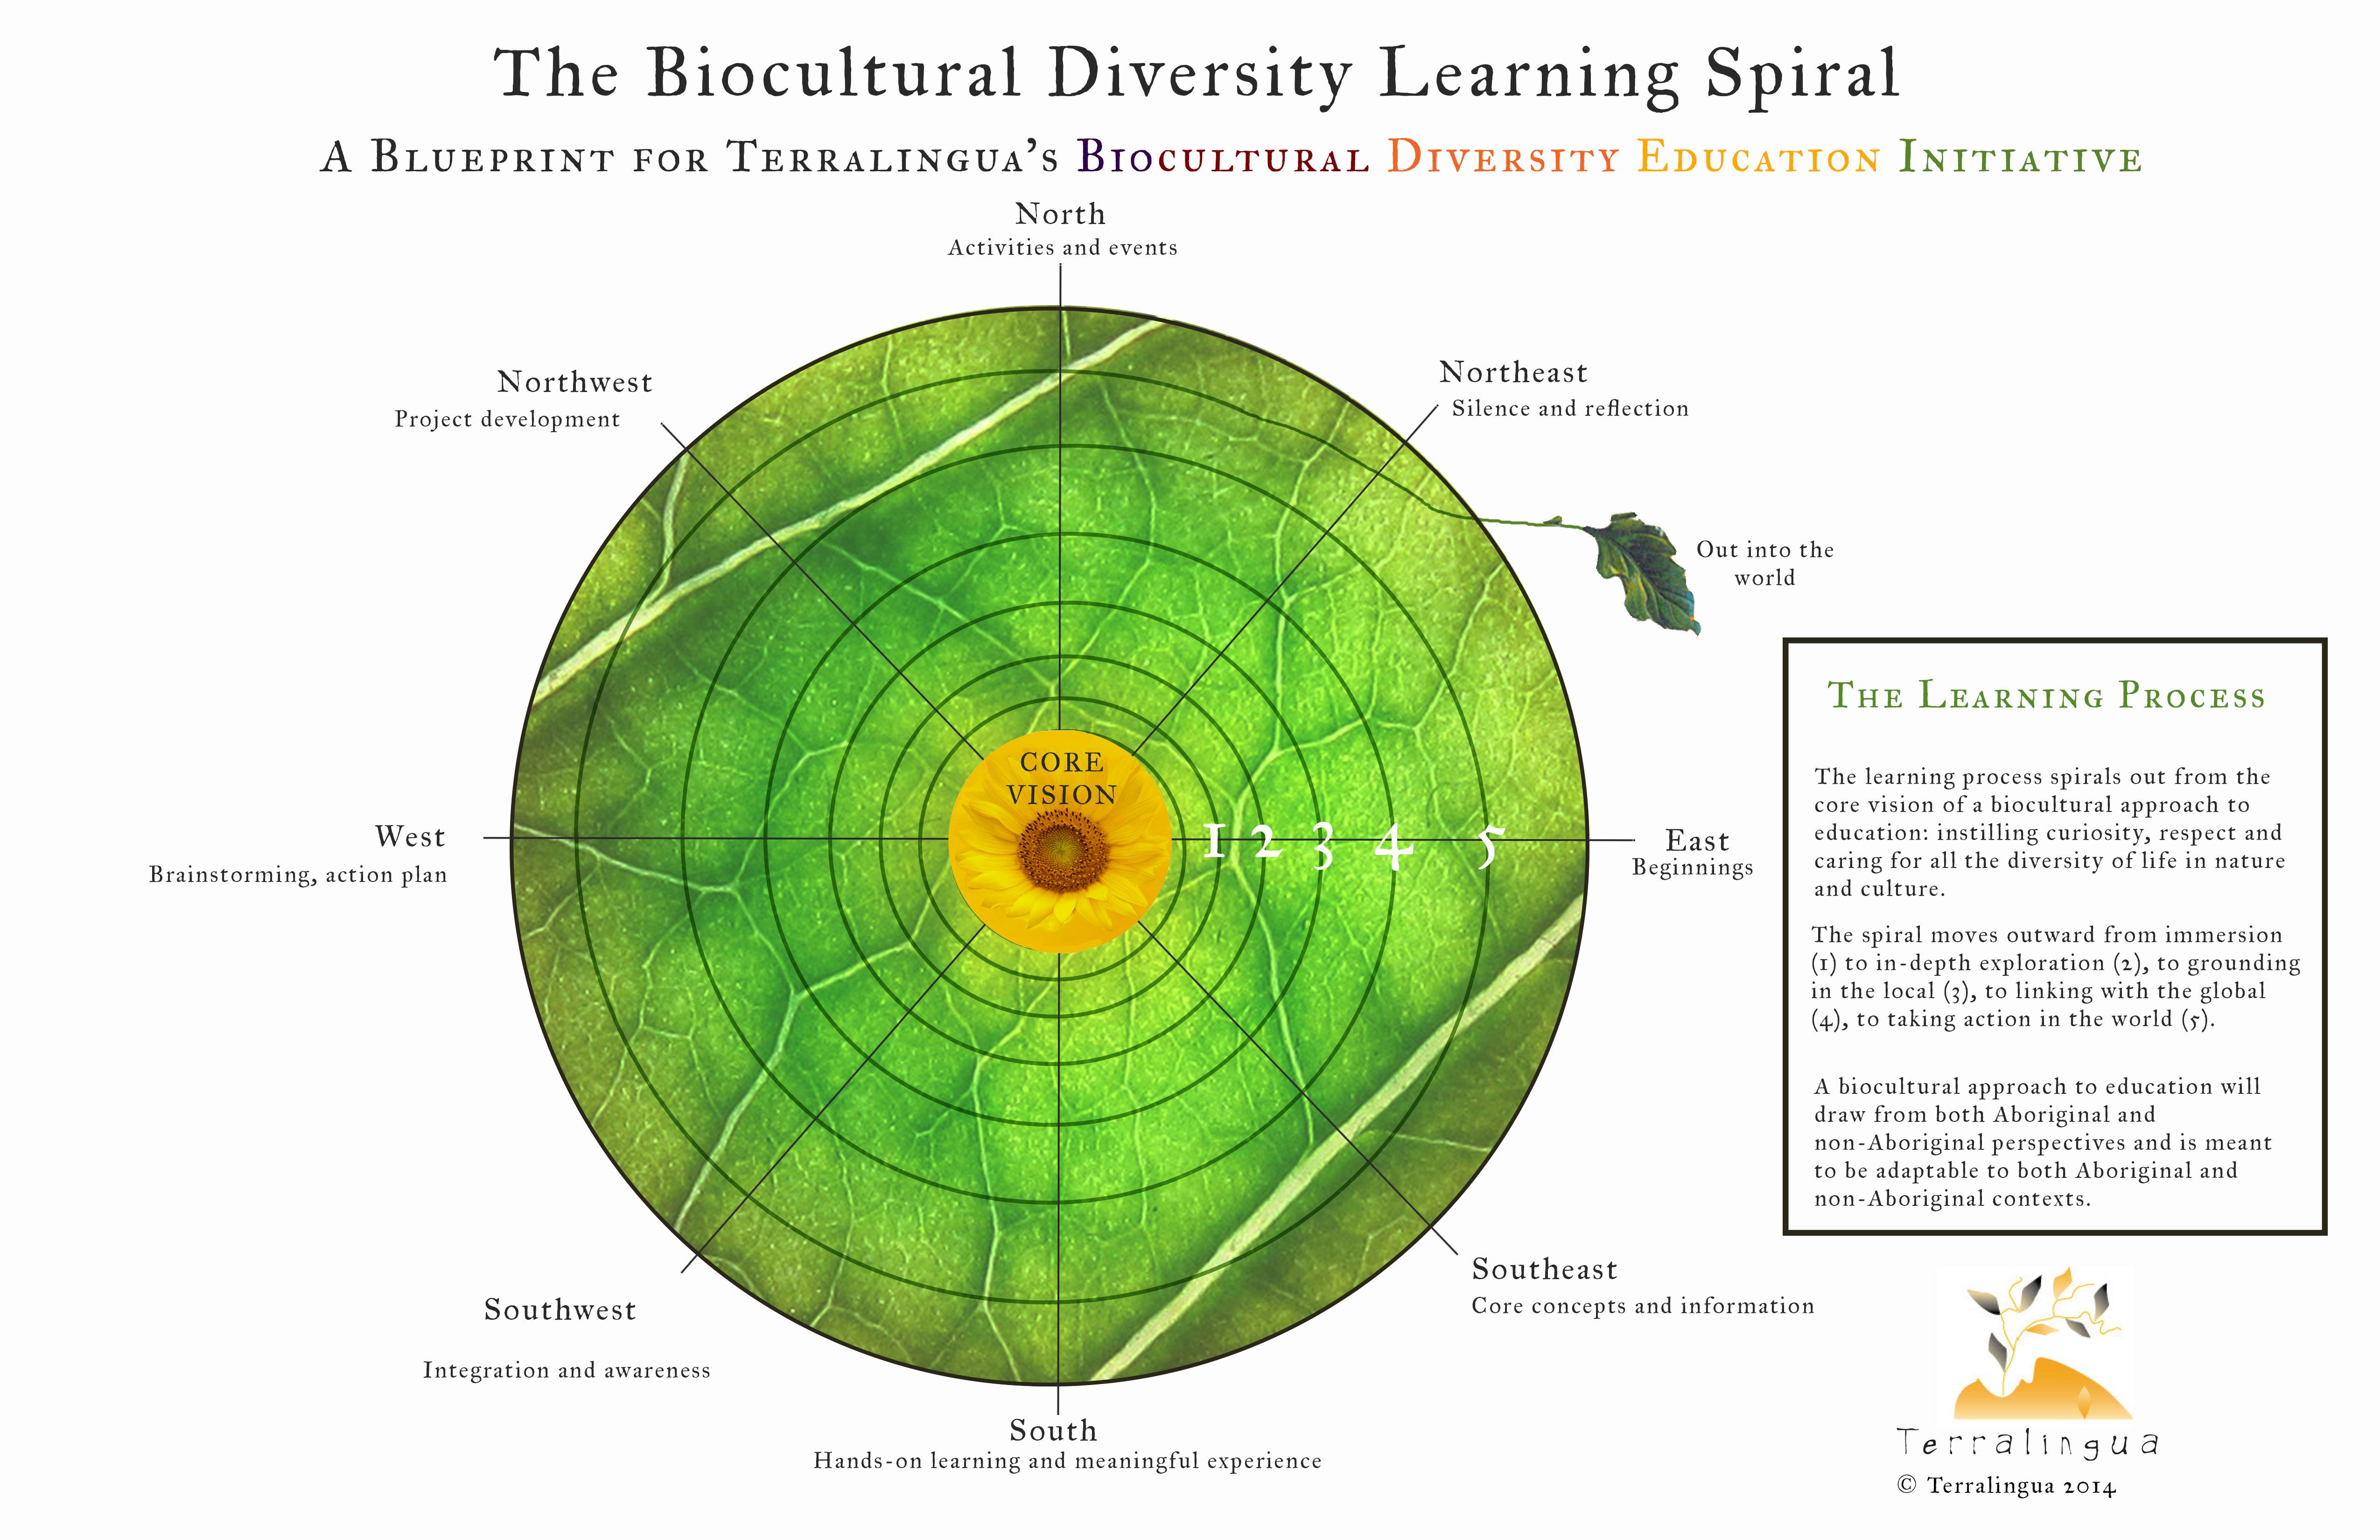 Biocultural Diversity Education - Terralingua